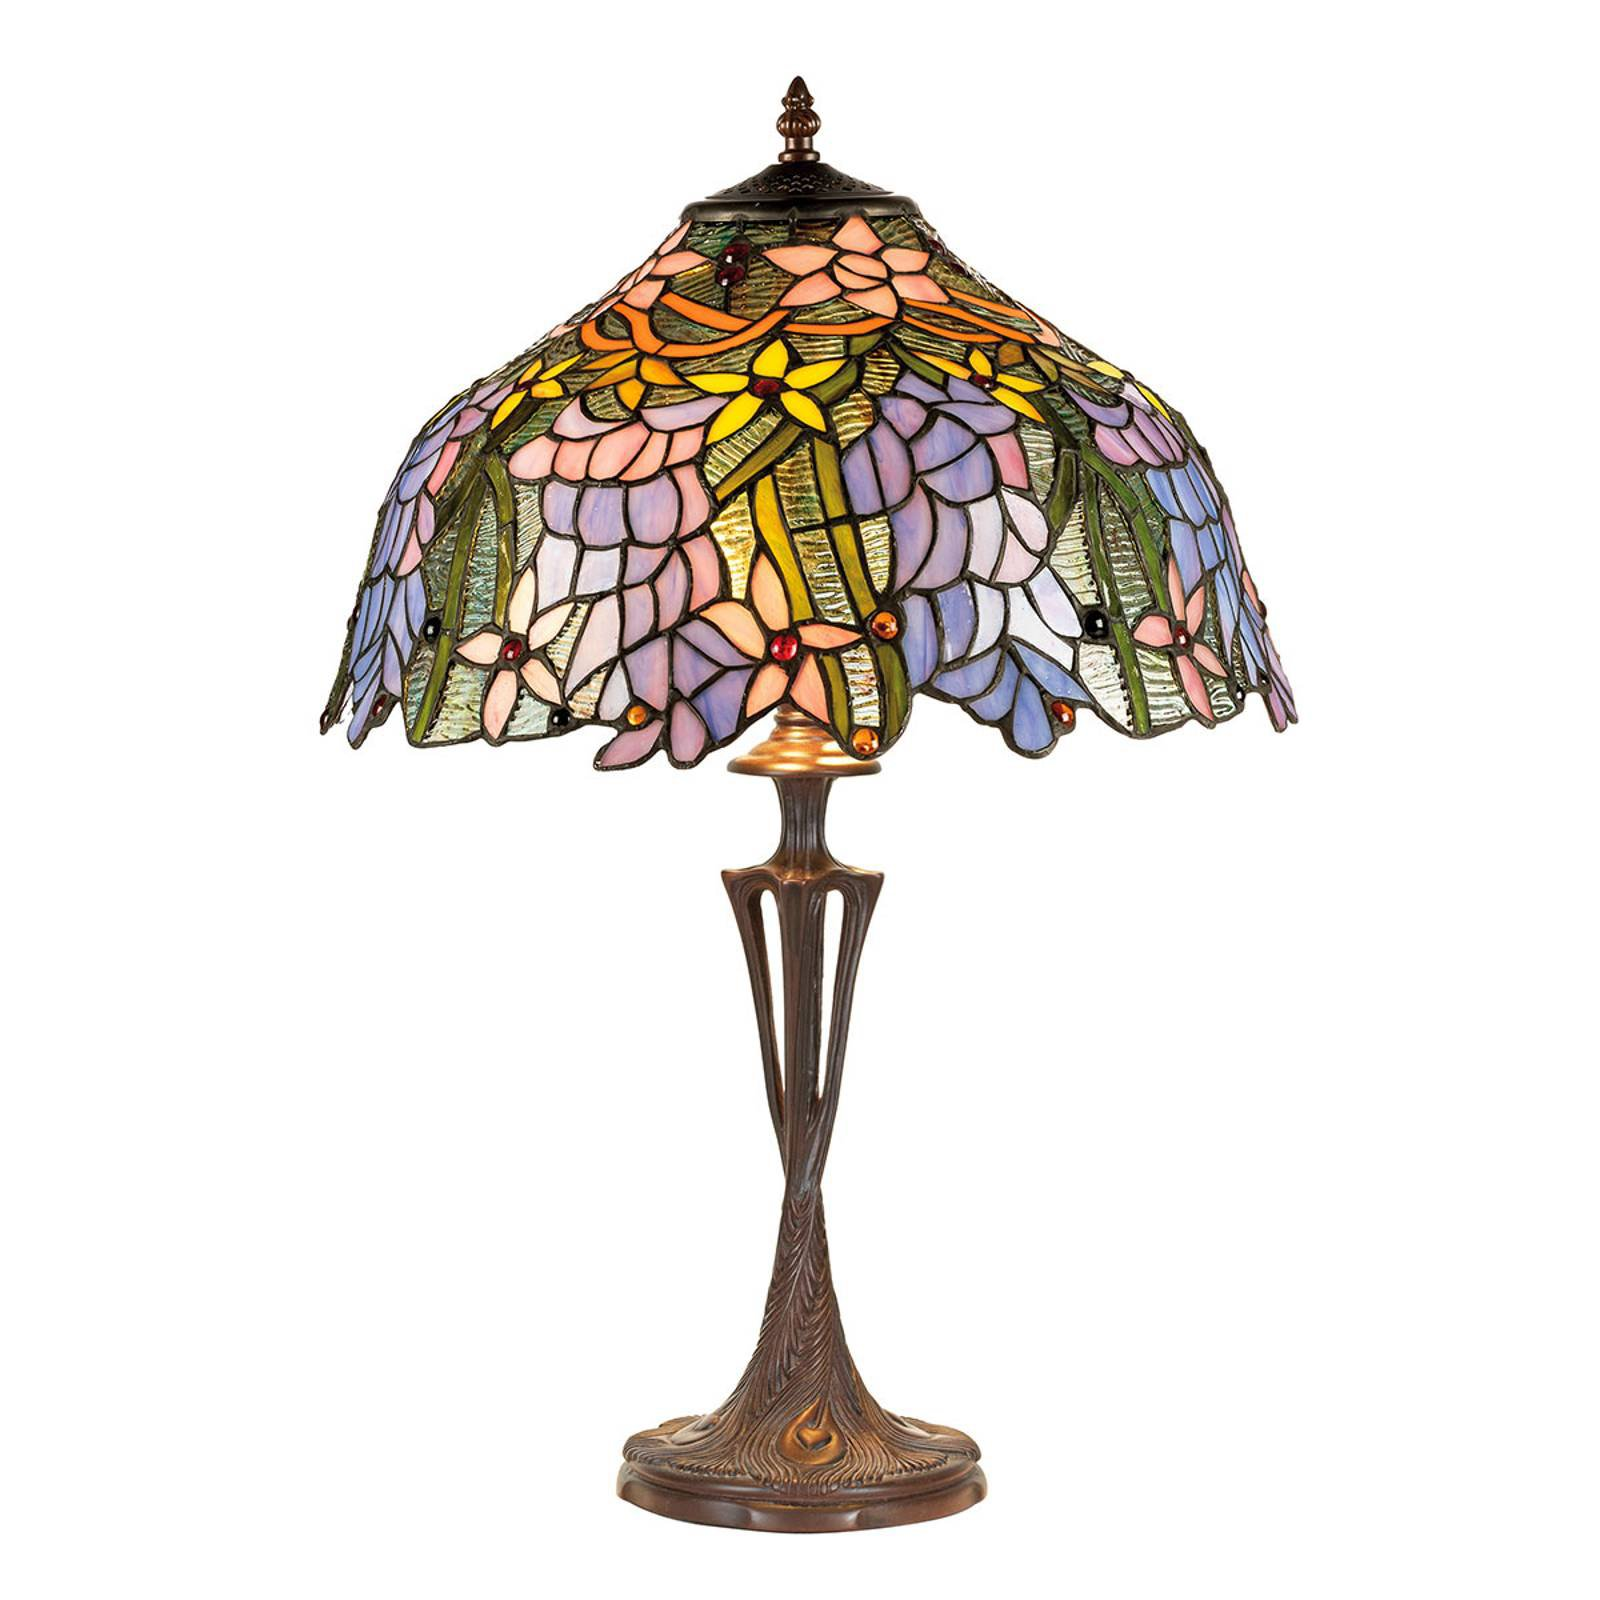 Bordlampe KT1082+PBLM11 i Tiffany-stil